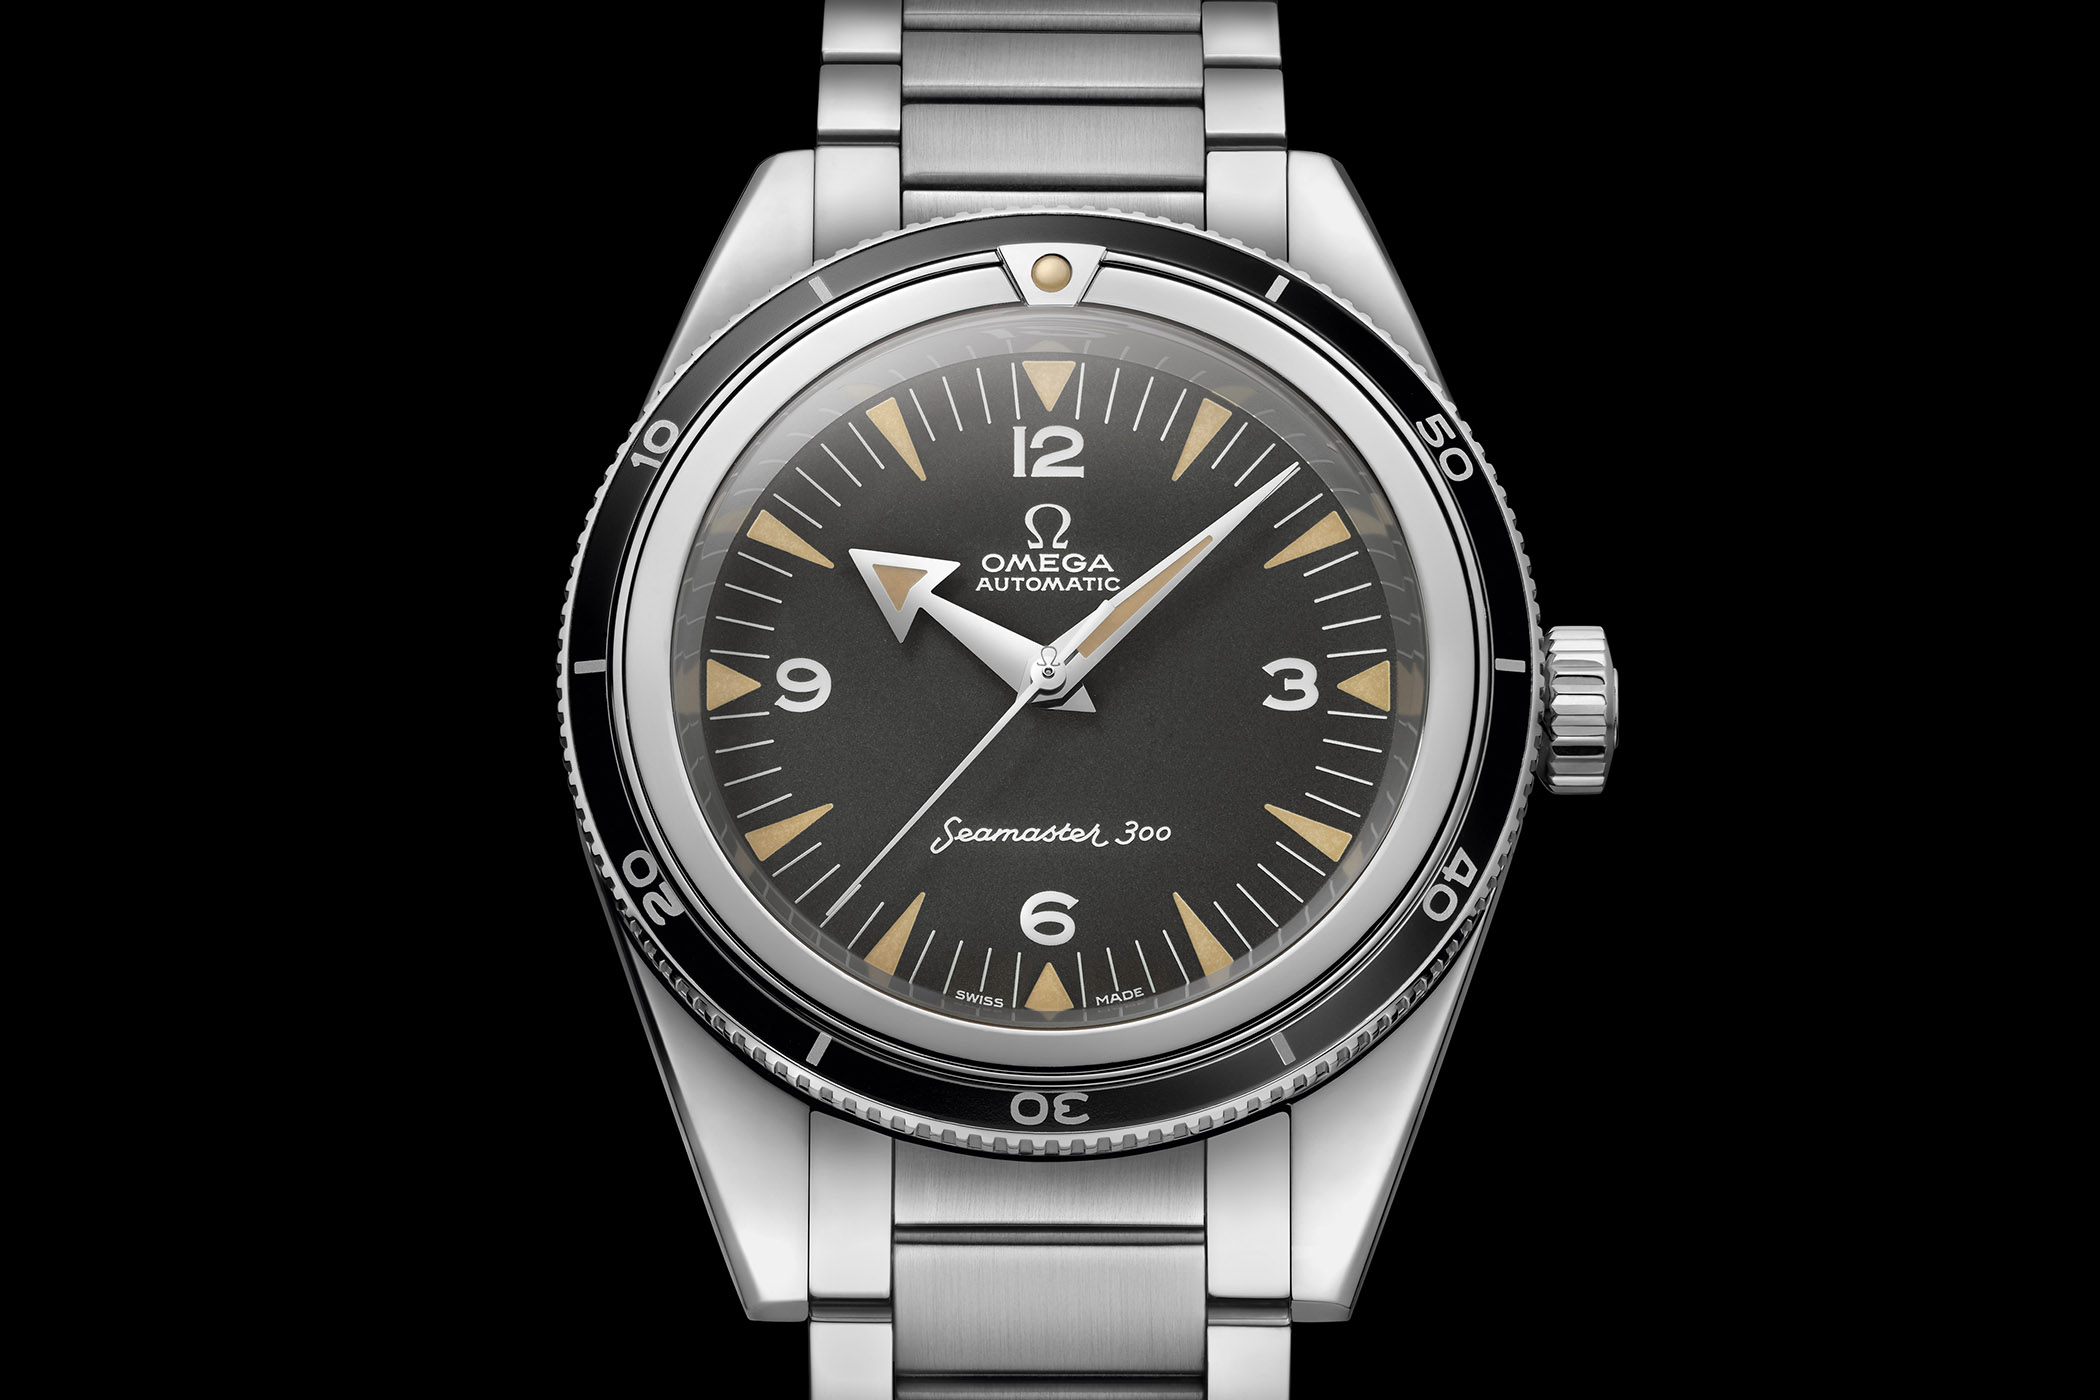 Omega Seamaster 300 60th Anniversary Limited Edition Master Chronometer 39mm - Baselworld 2017